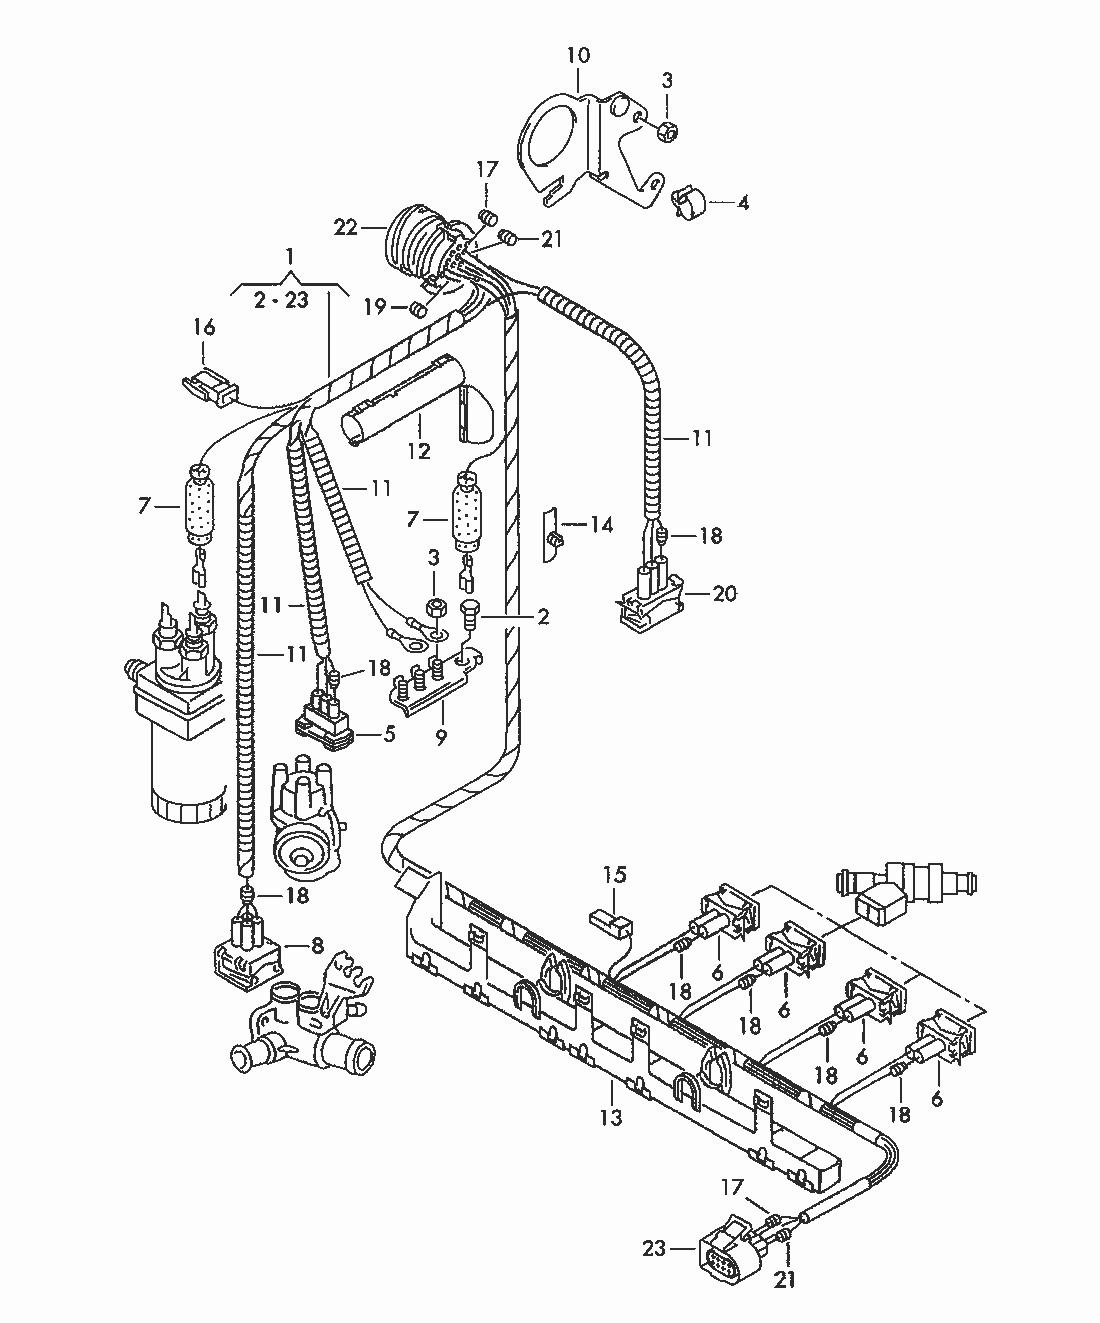 Mk3 Vr6 Engine Diagram - 1965 Dodge Dart Fuse Box - pipiiing-layout .yenpancane.jeanjaures37.fr | Vr6 Engine Diagram Color |  | Wiring Diagram Resource